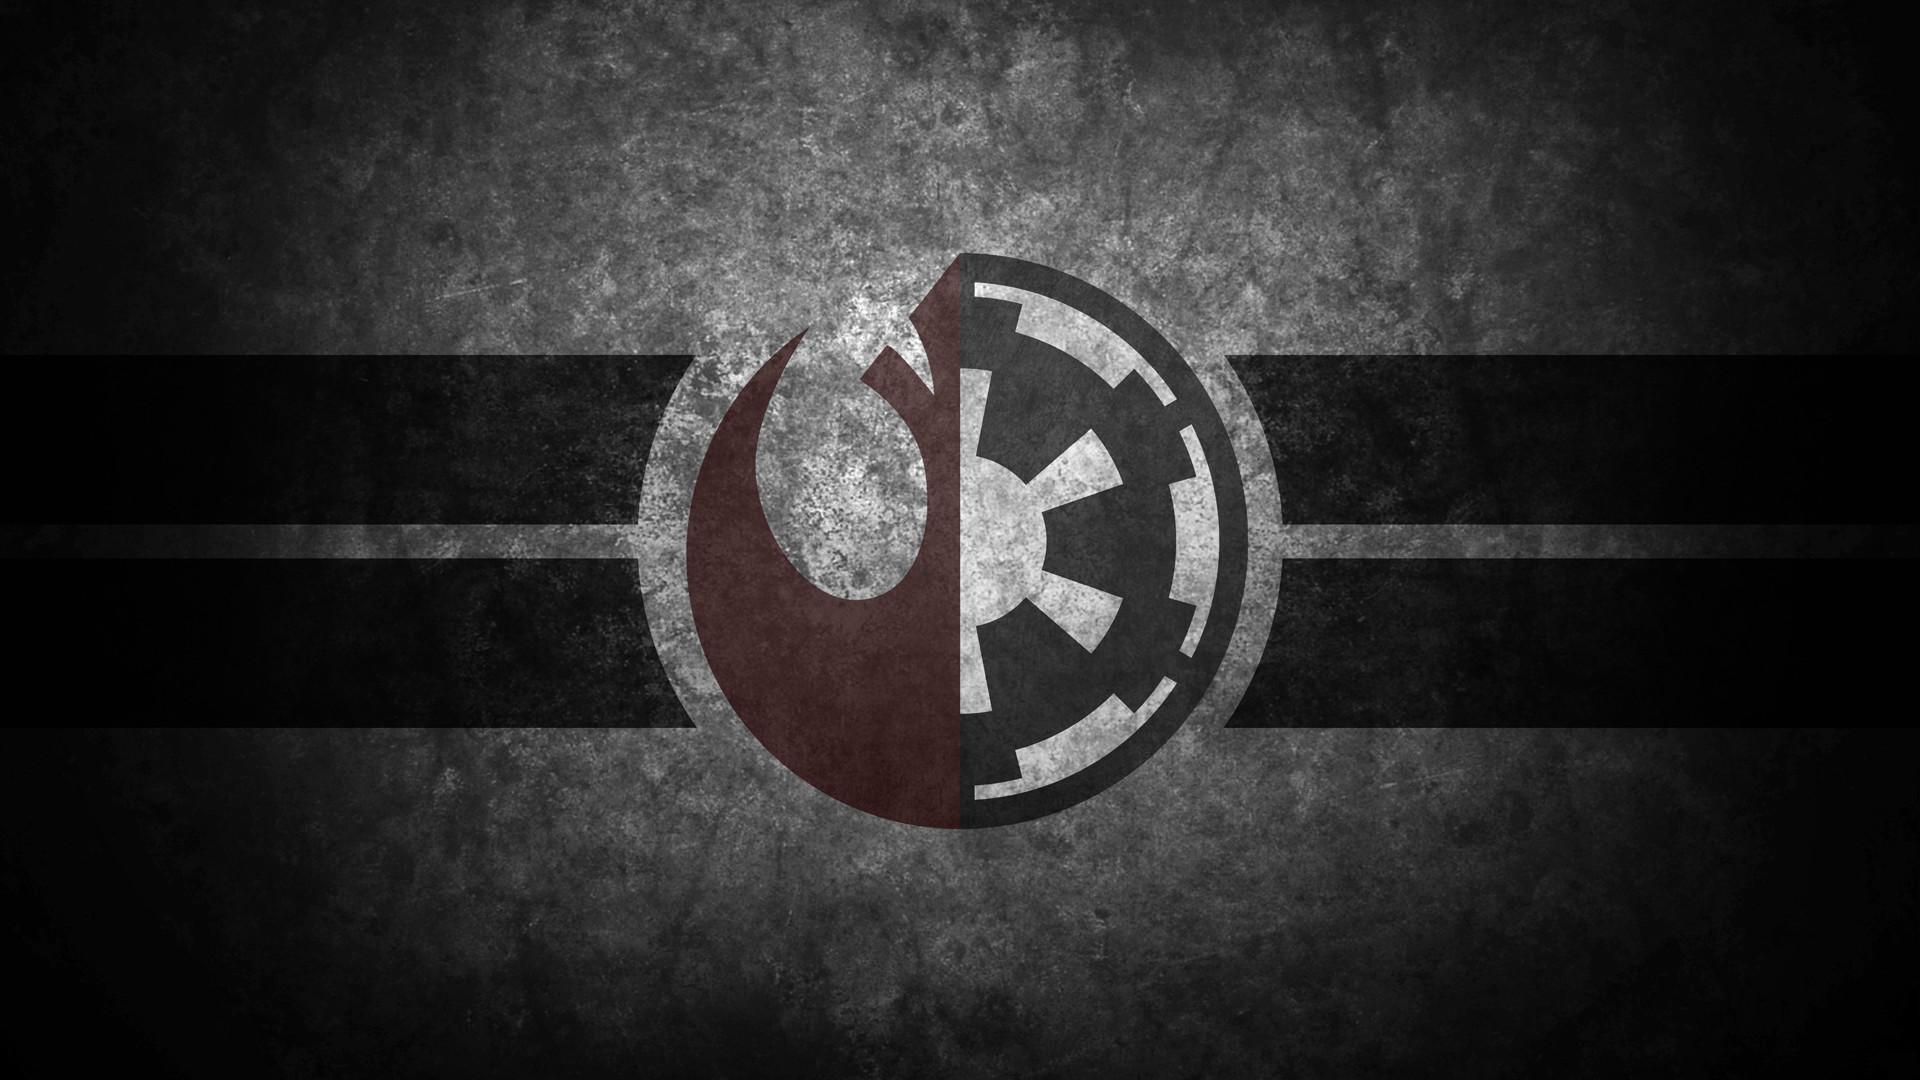 Star Wars Divided Allegiance Desktop Wallpaper by swmand4 on .